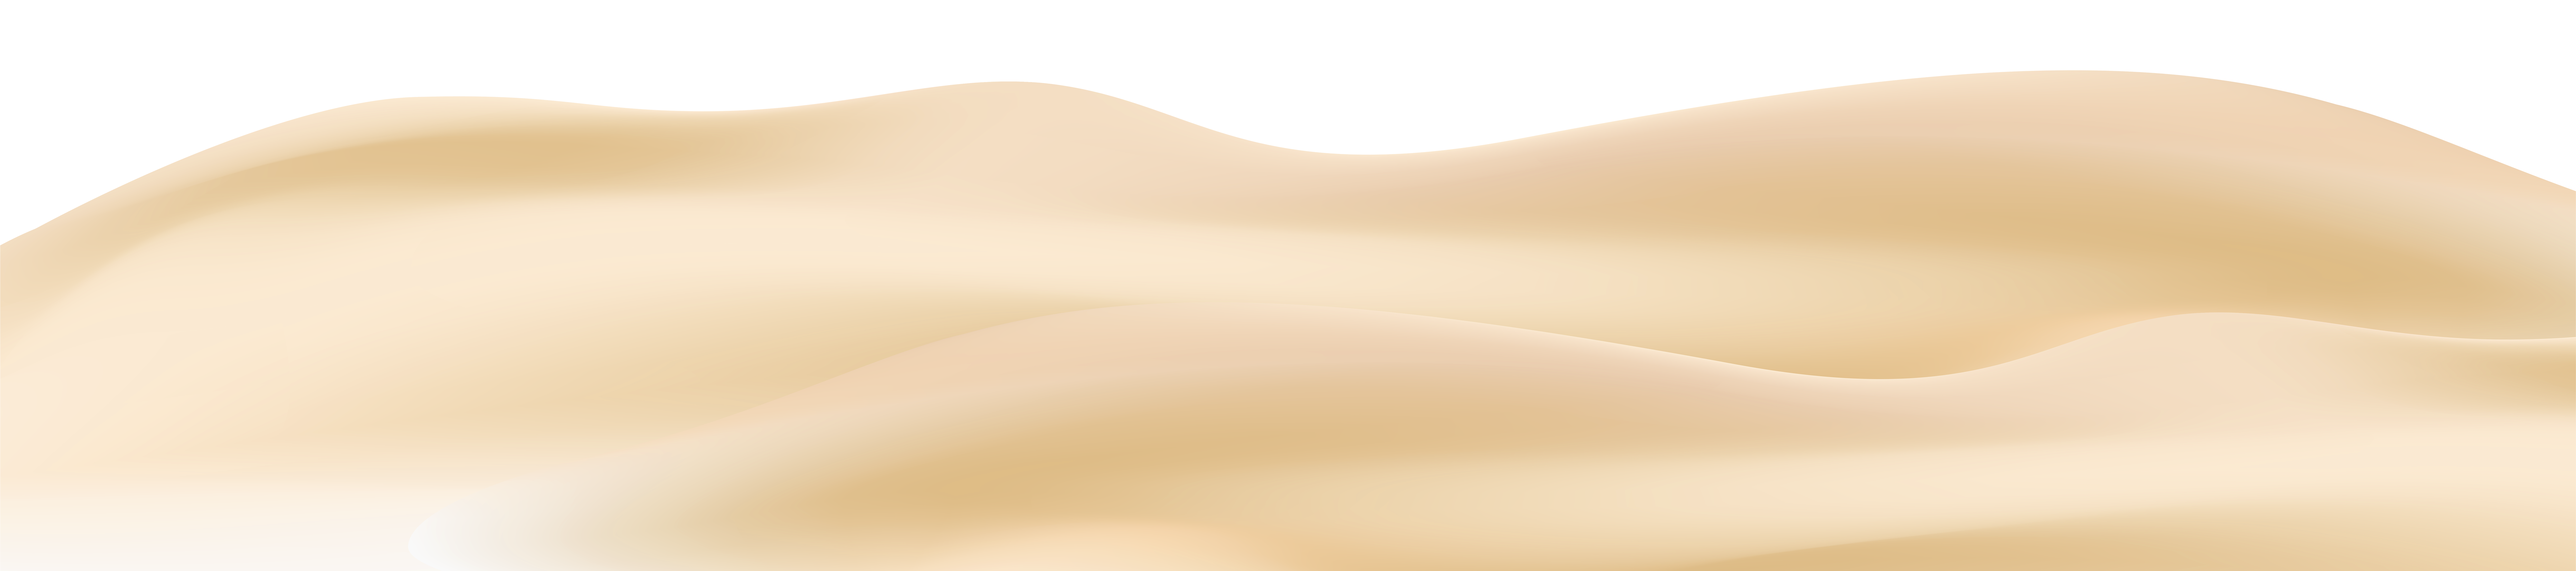 Sand Clip Art PNG Image